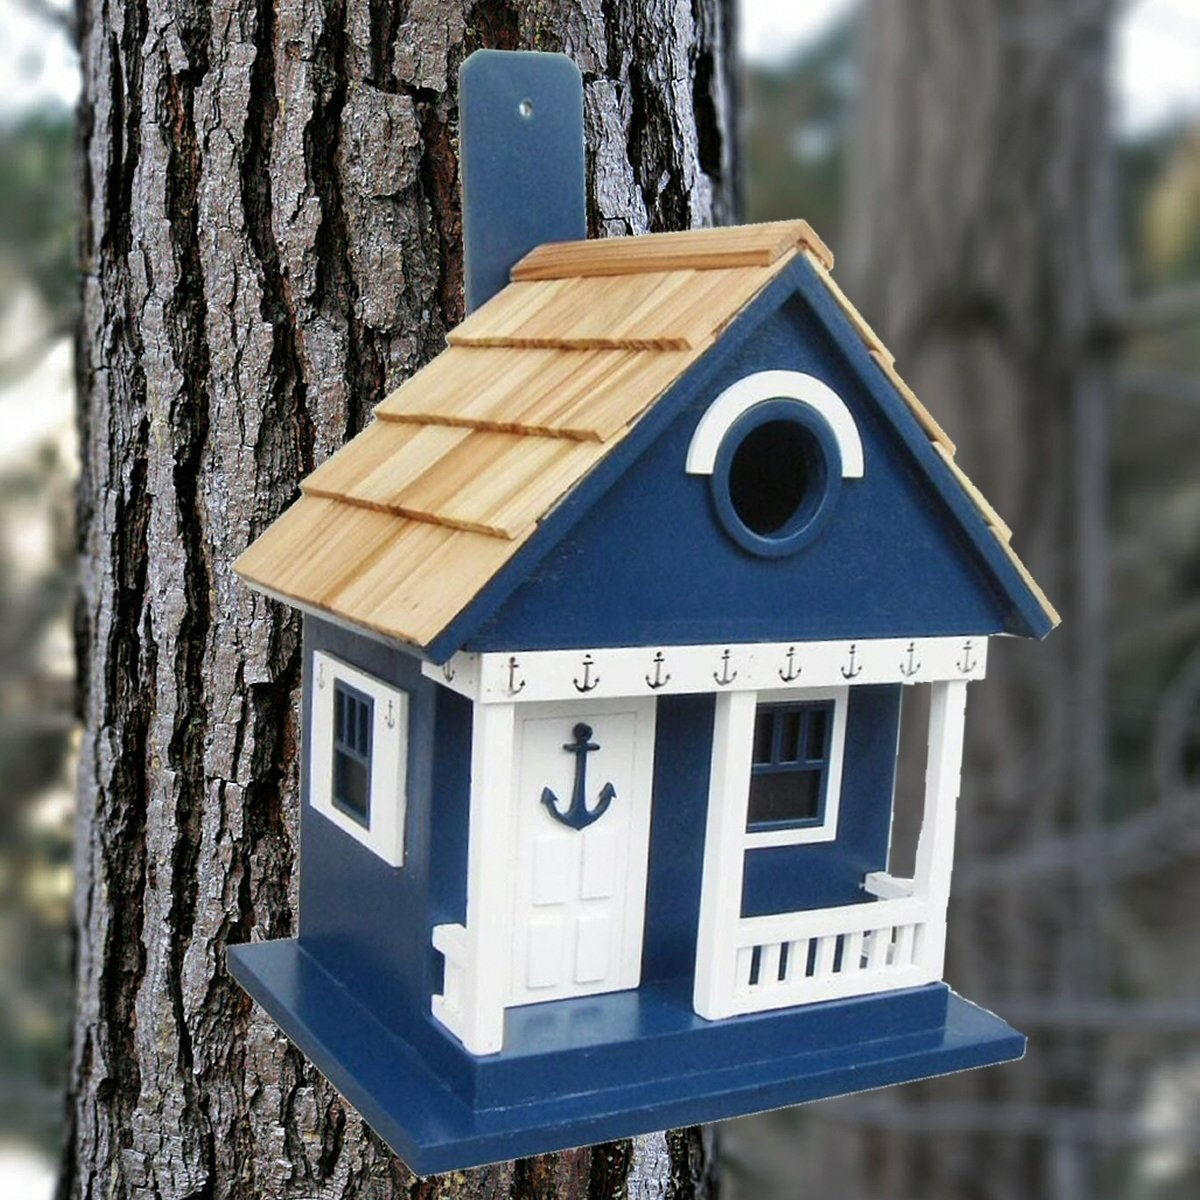 Anchor cottage navy birdhouse bird house kits bird